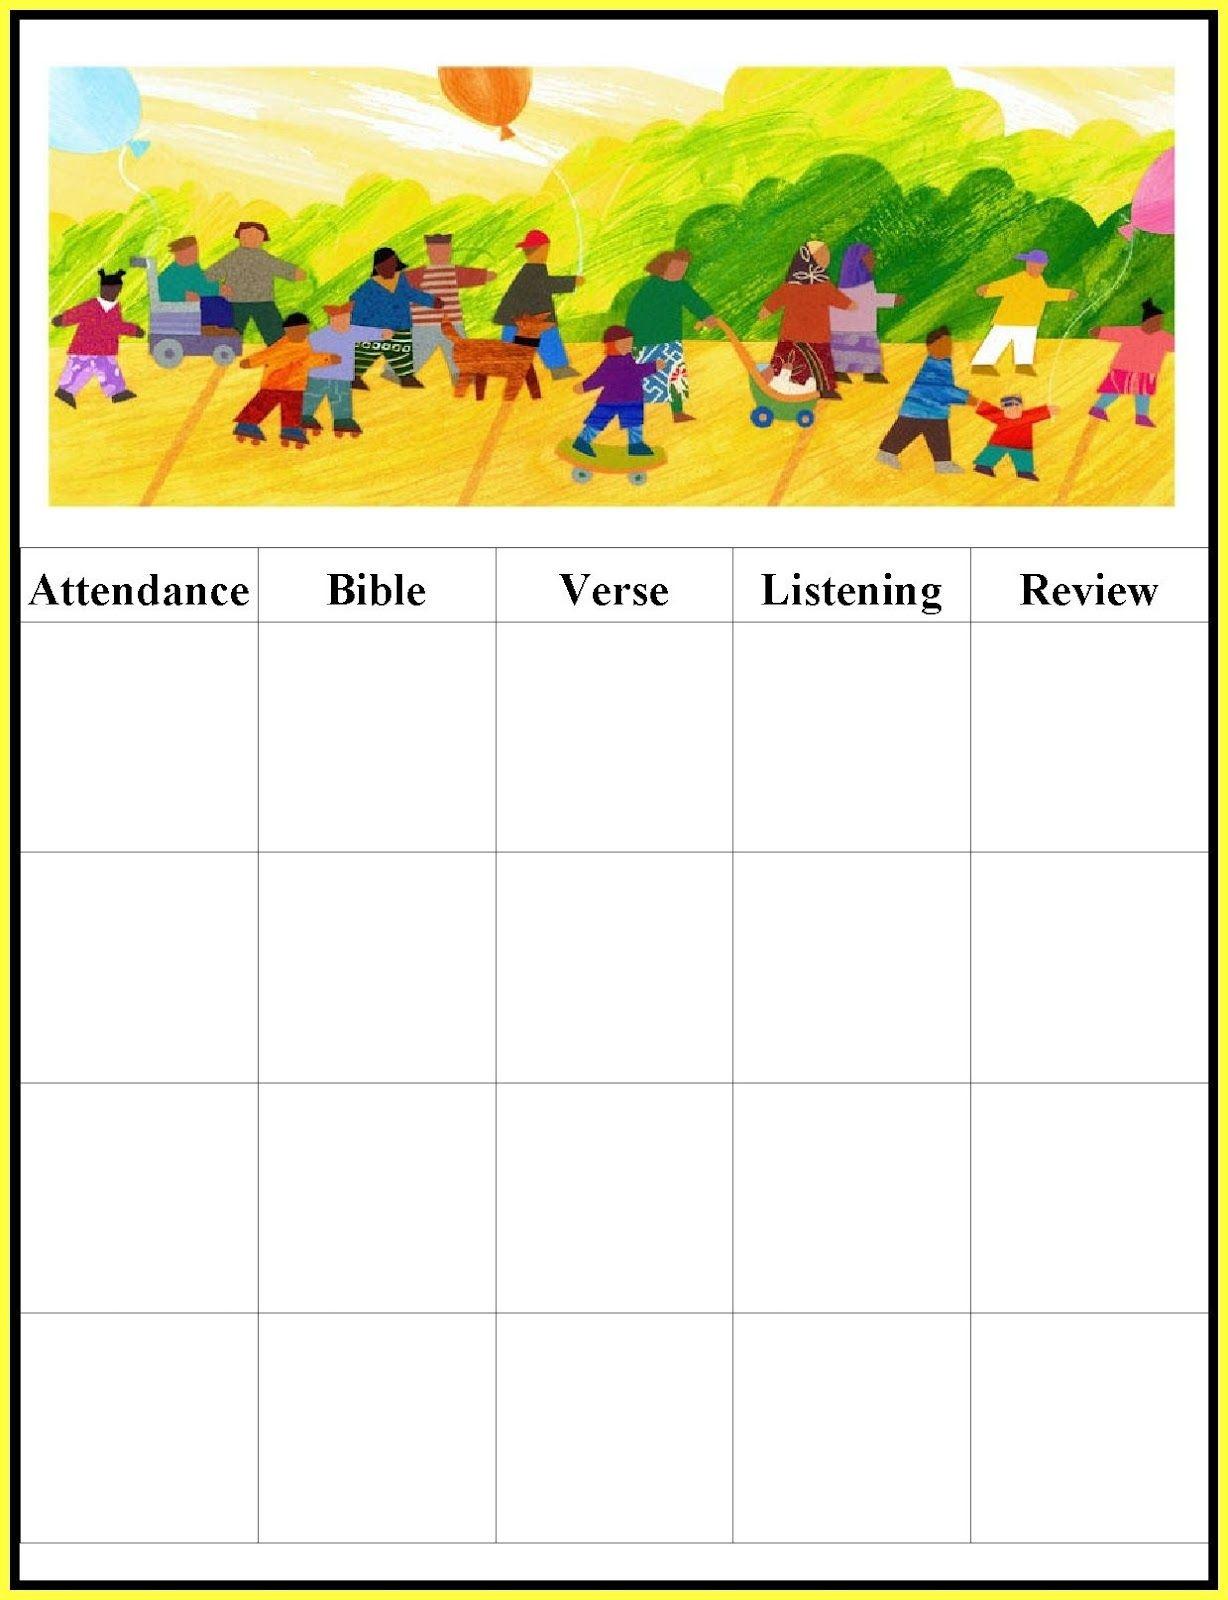 Childrens Gems In My Treasure Box: Sunday School - Attendance Charts - Sunday School Attendance Chart Free Printable